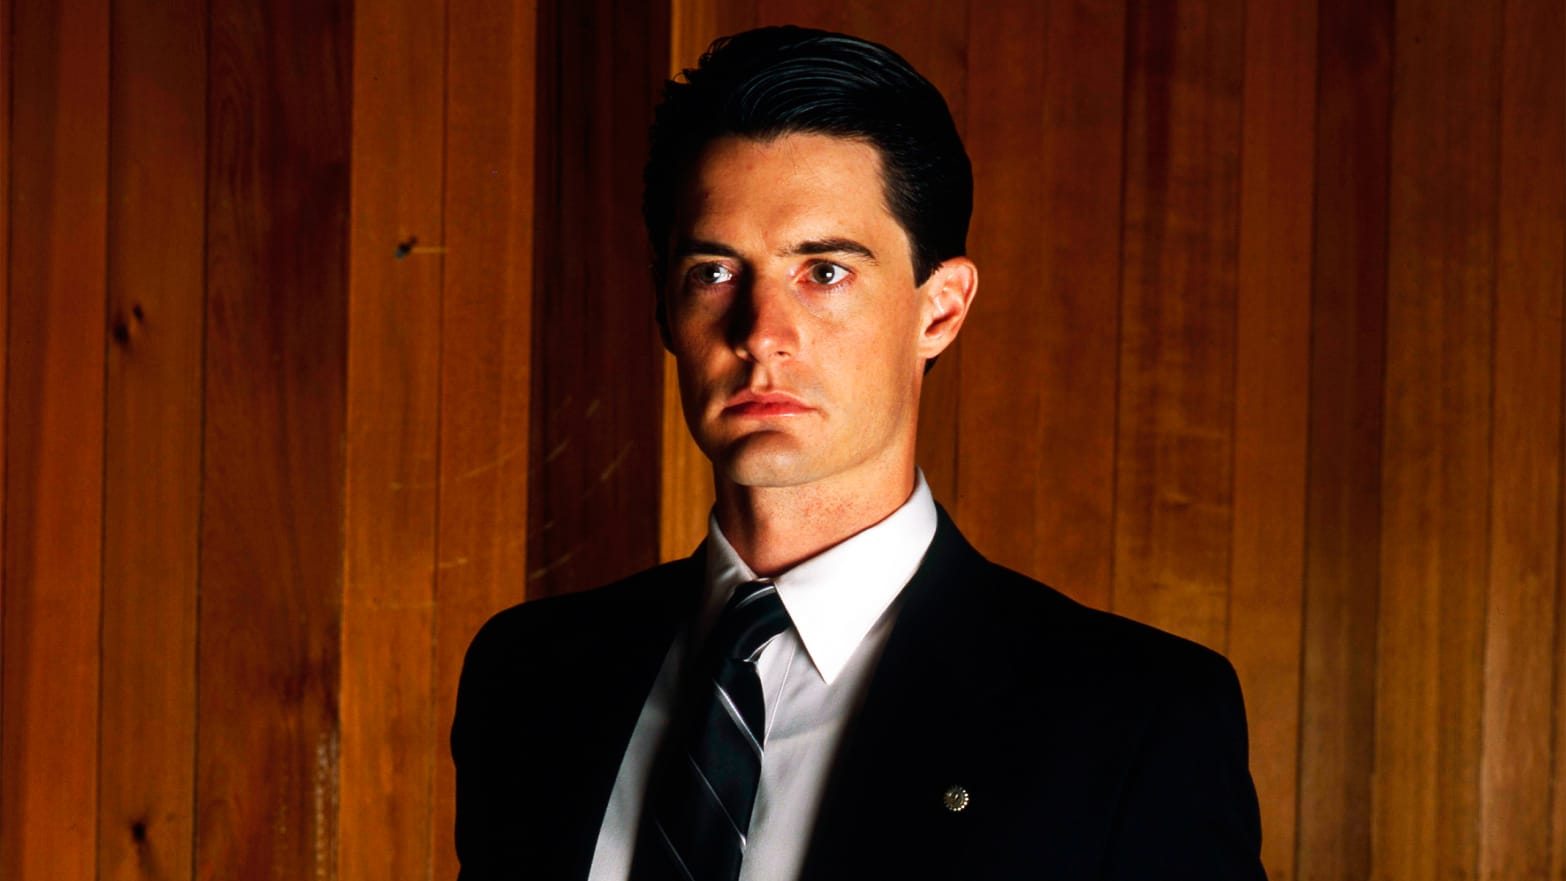 FBI agent Dale Cooper (Kyle MacLachlan) in Twin Peaks (1990)